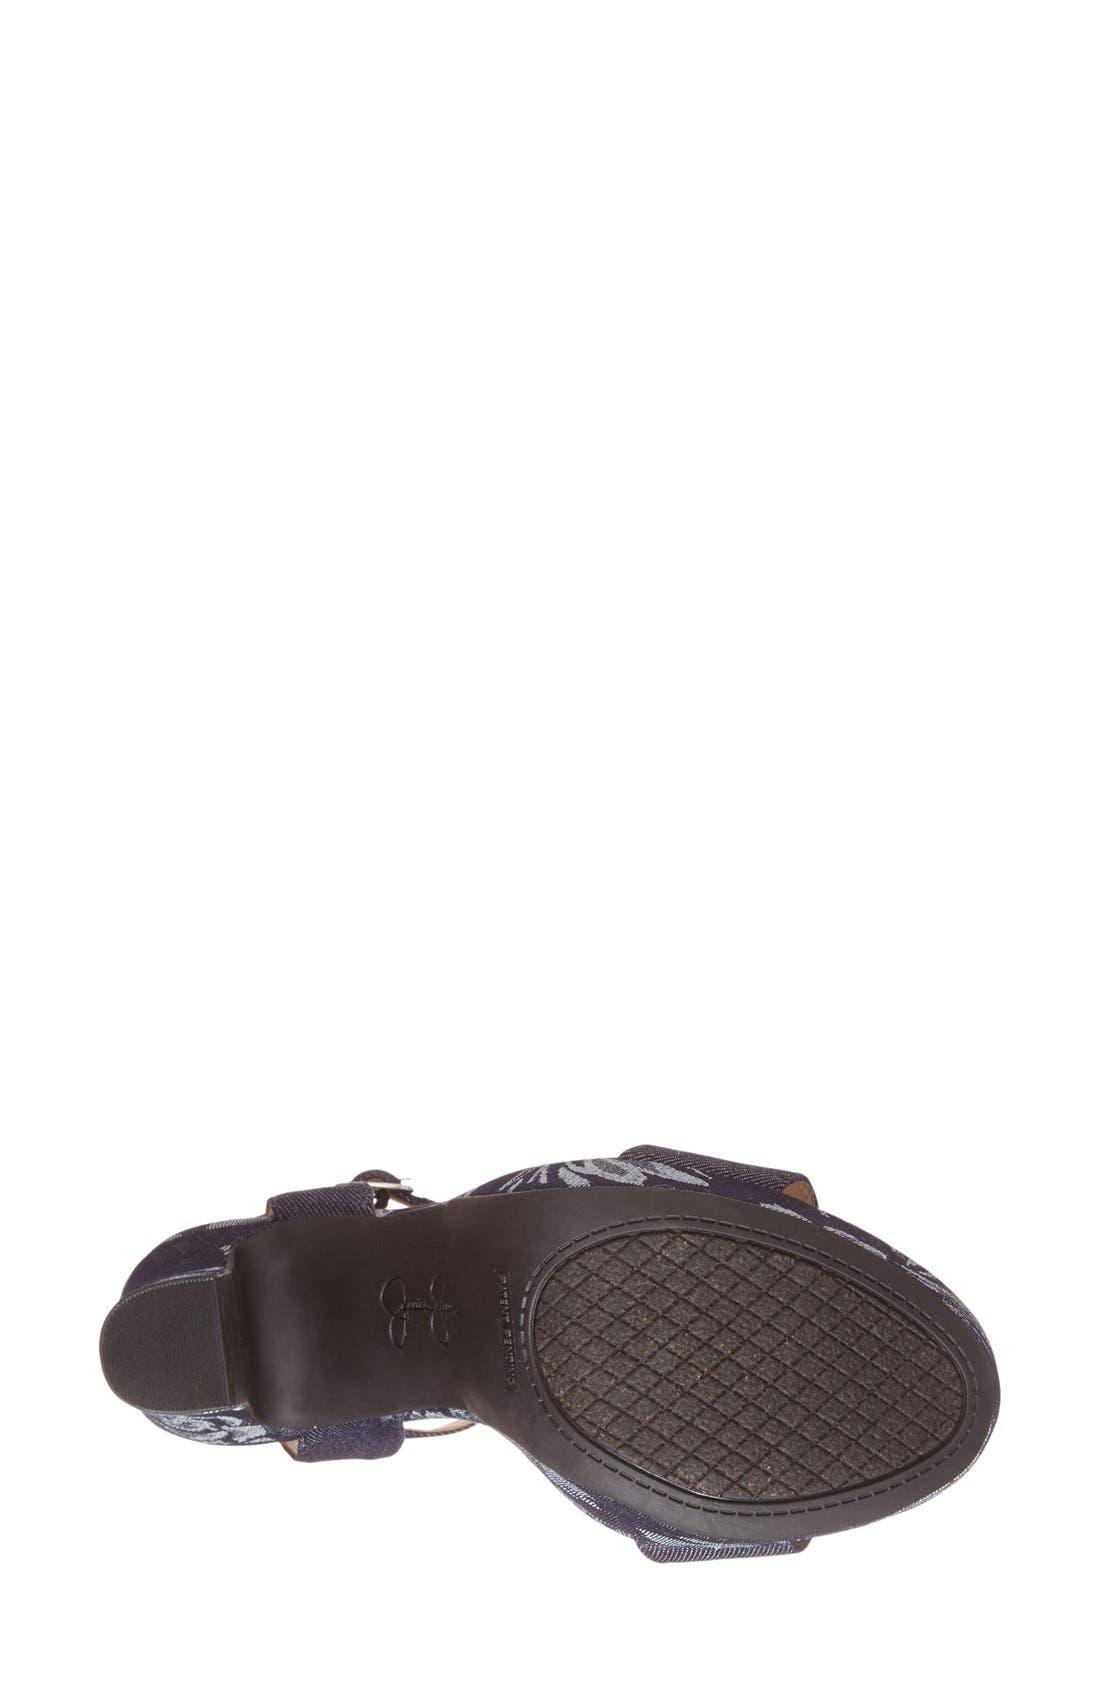 'Blaney' Platform Sandal,                             Alternate thumbnail 4, color,                             Indigo/ Indigo Fabric